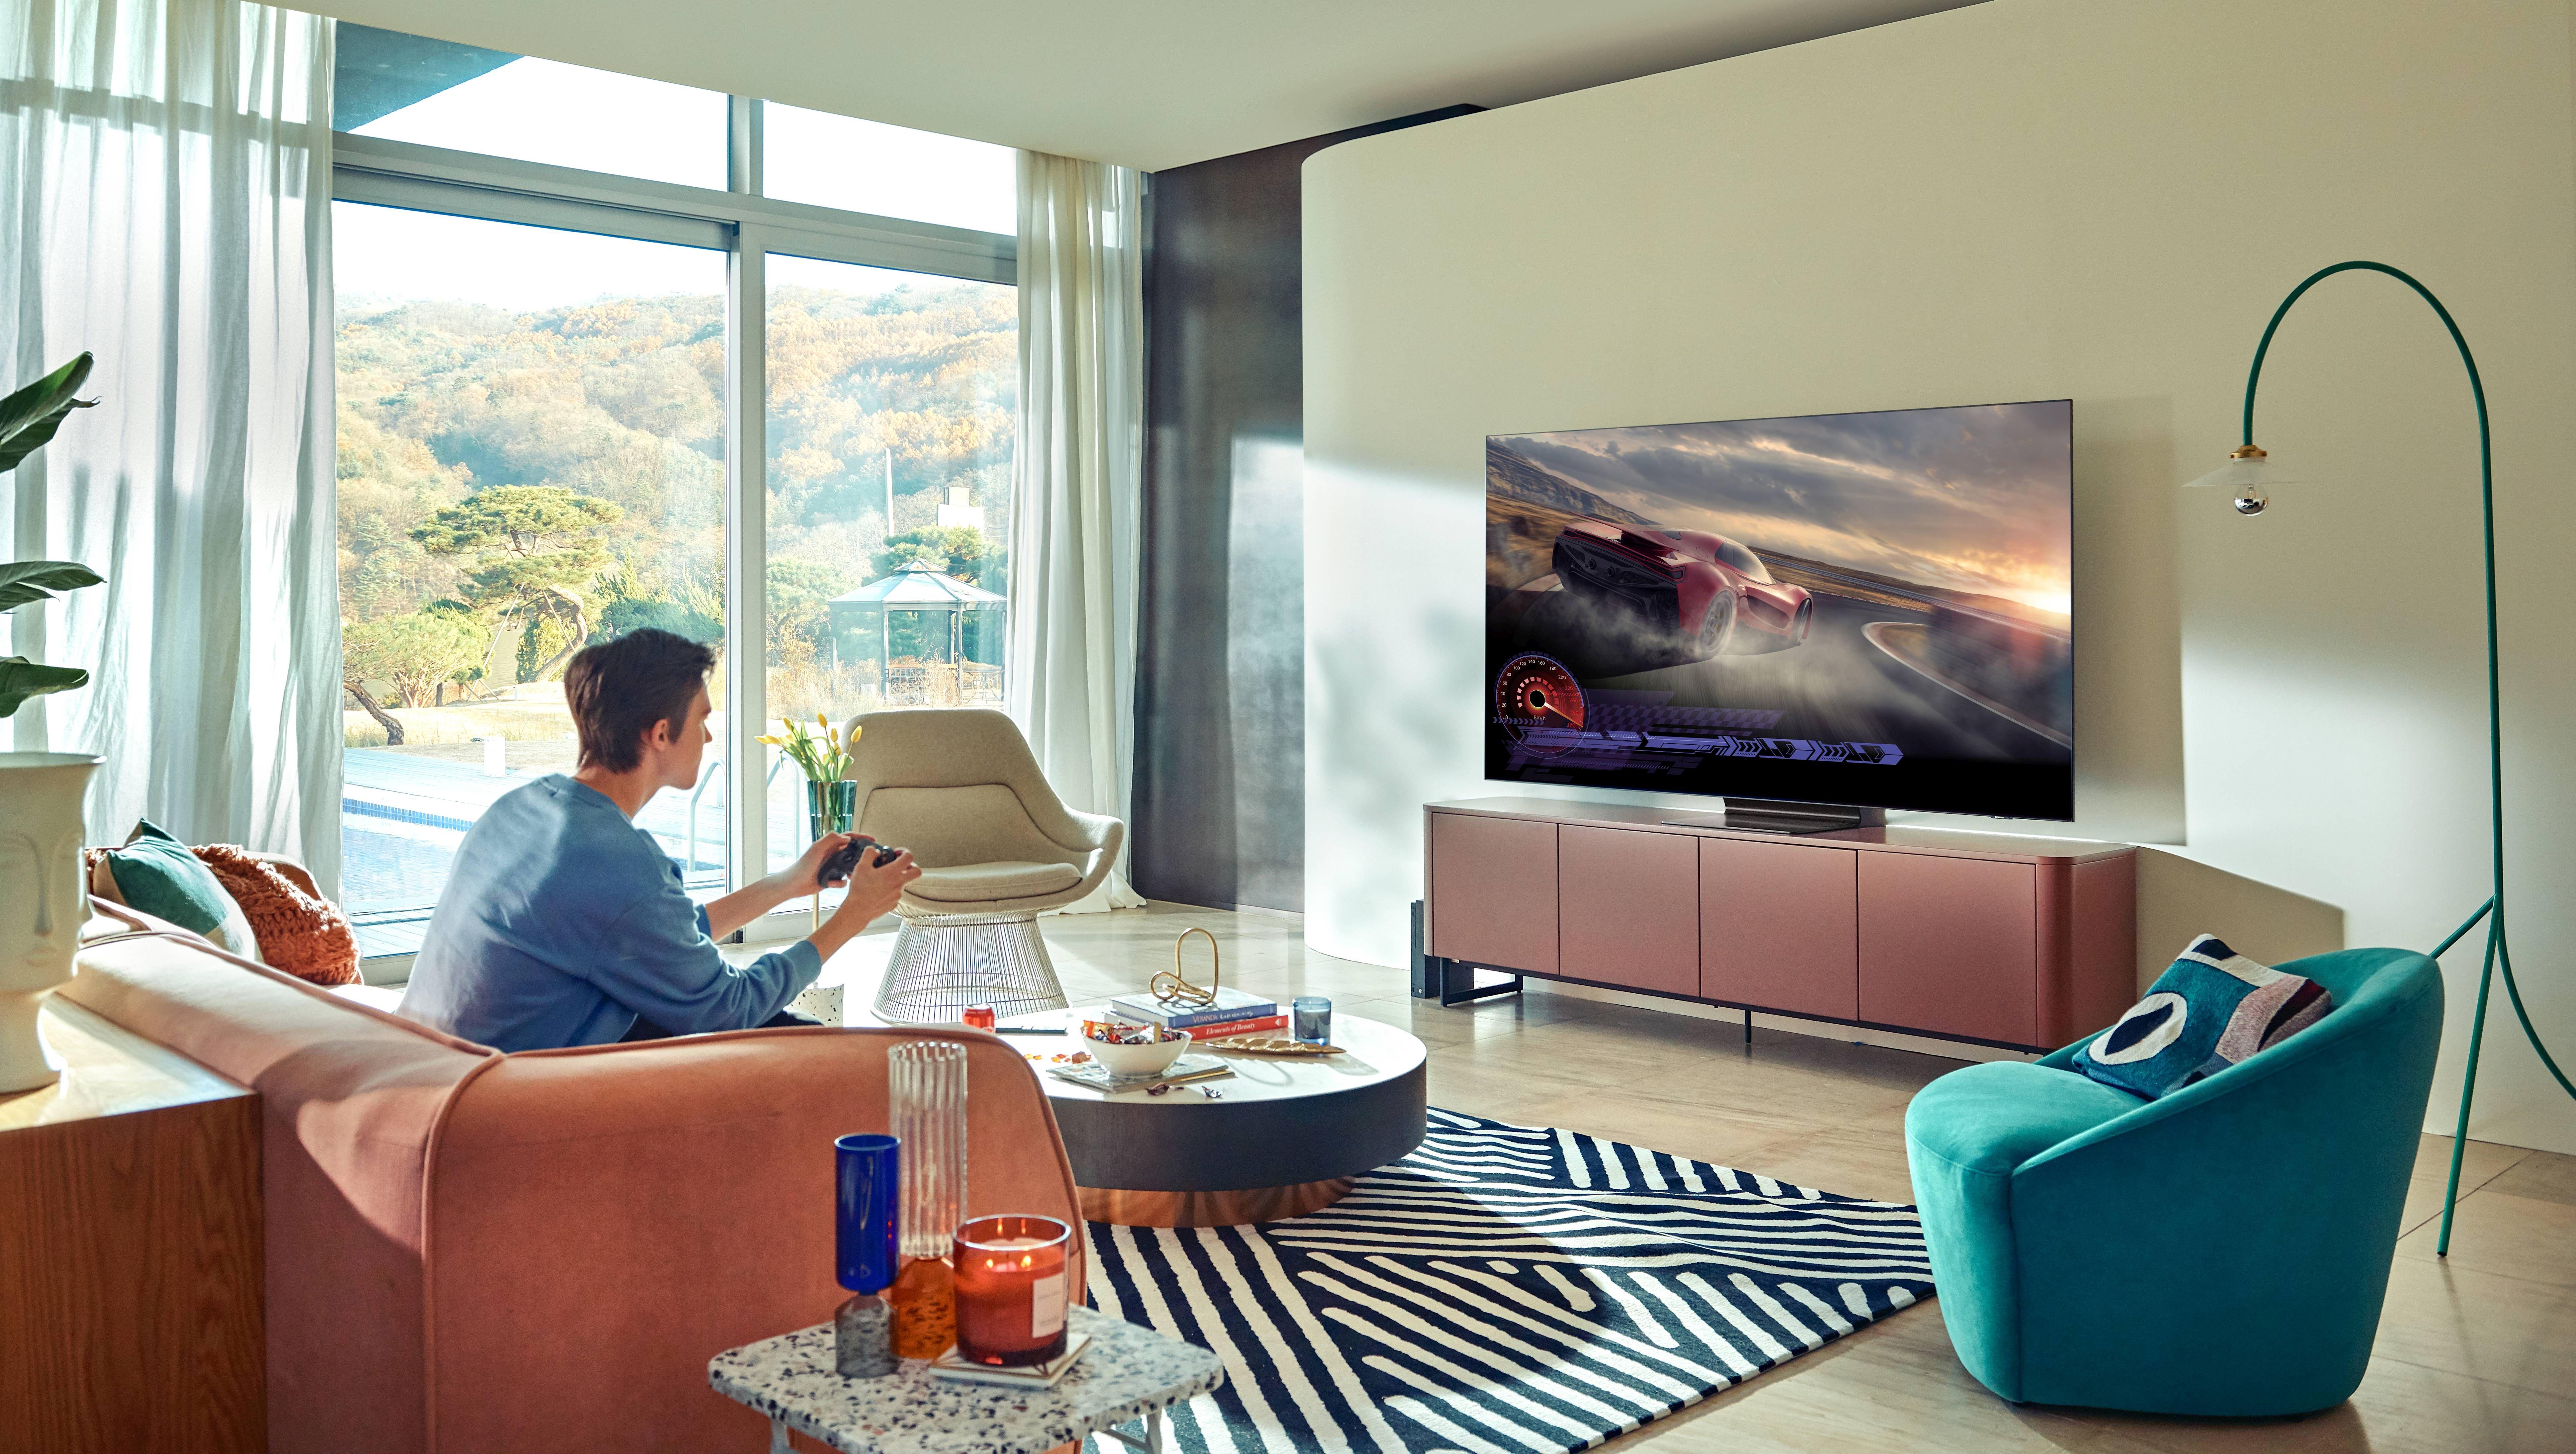 Samsung: Polacy pokochali serwisy VoD i platformy smart TV